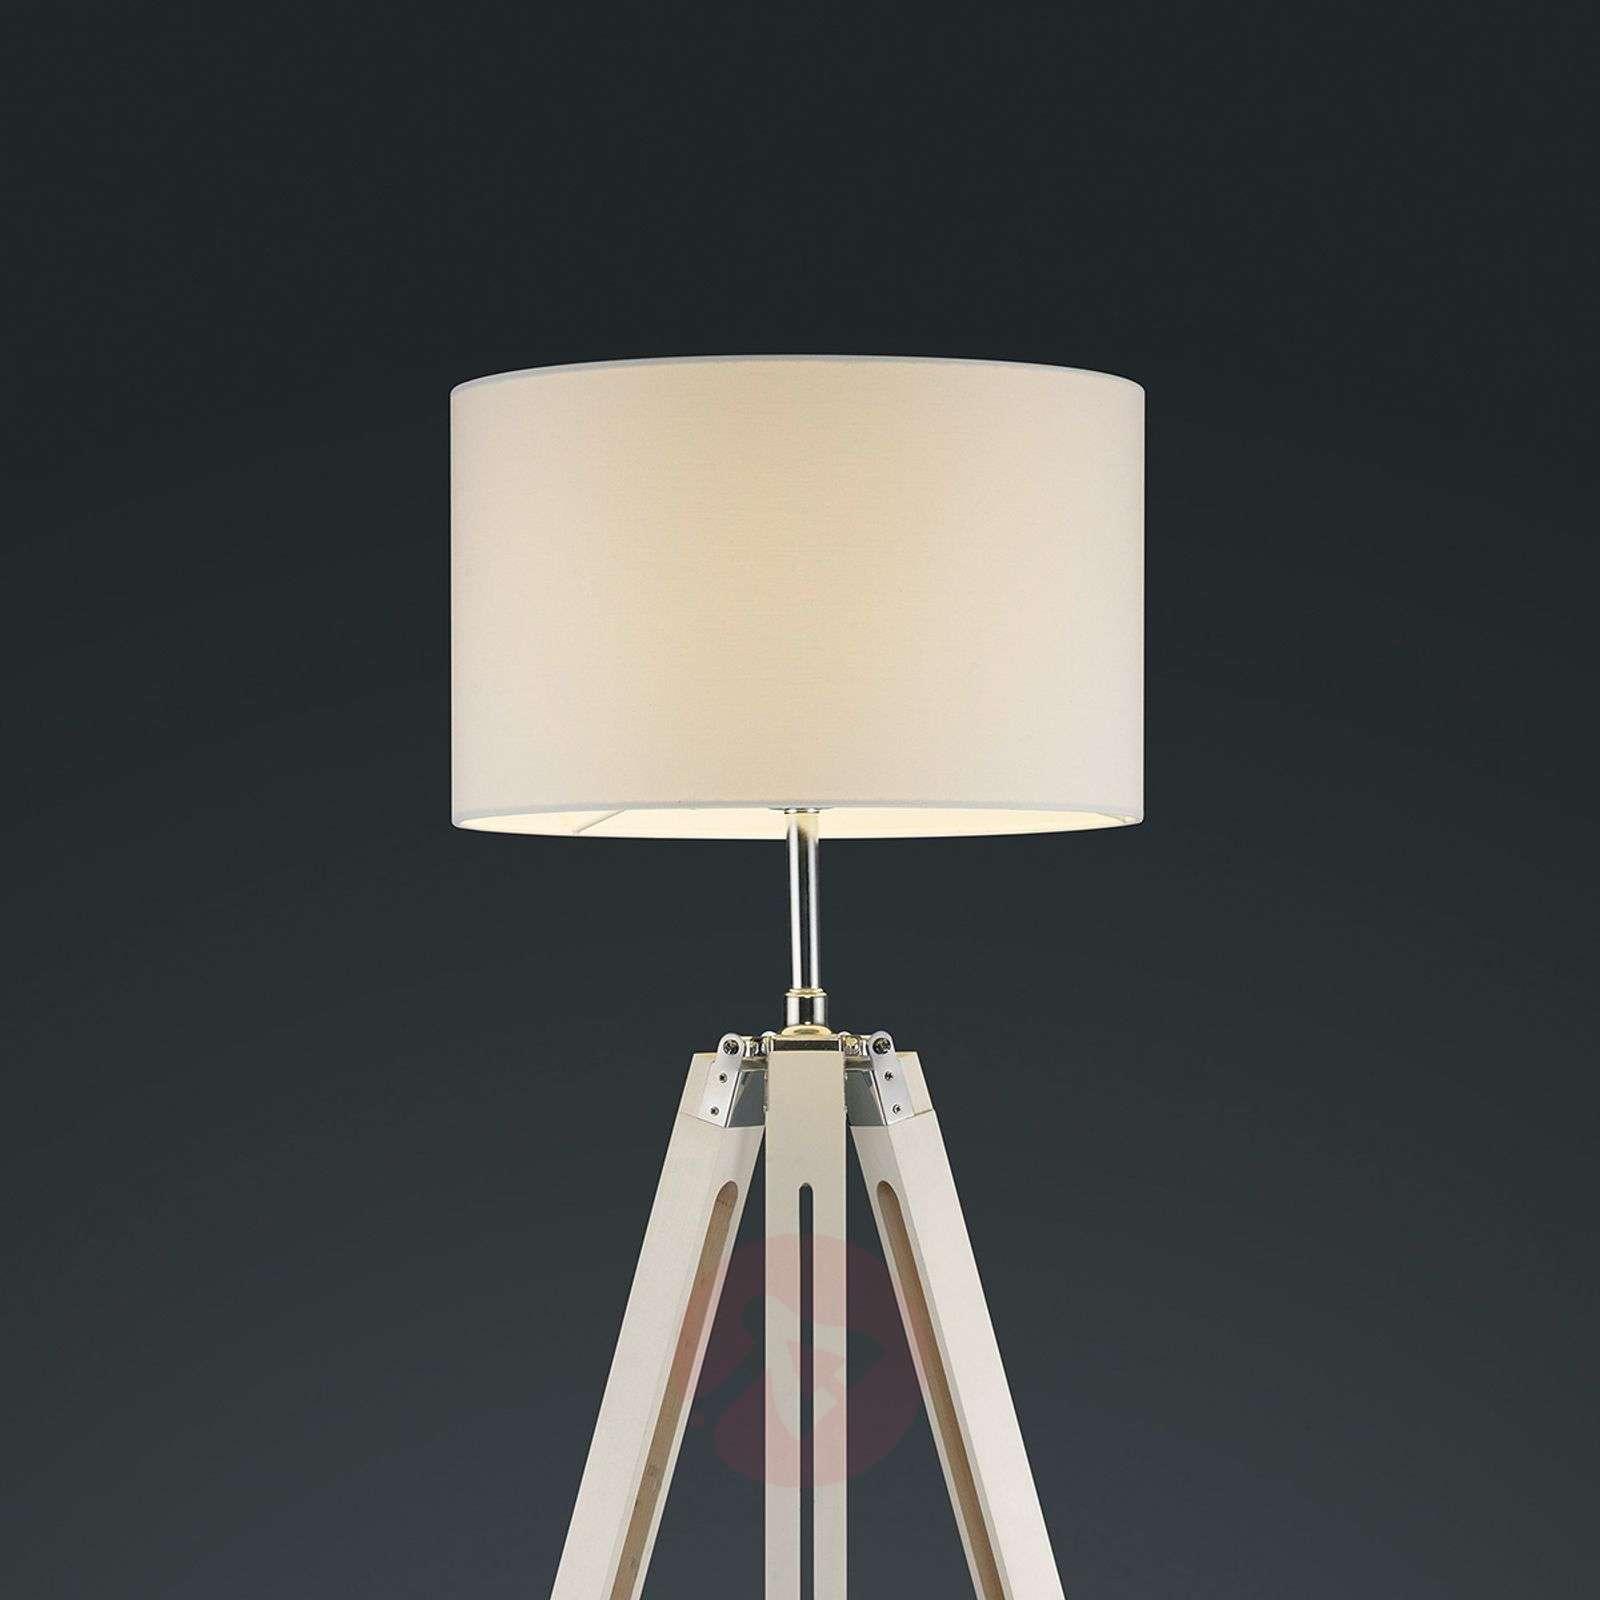 Gent three-legged floor lamp with white lampshade-9005103-01